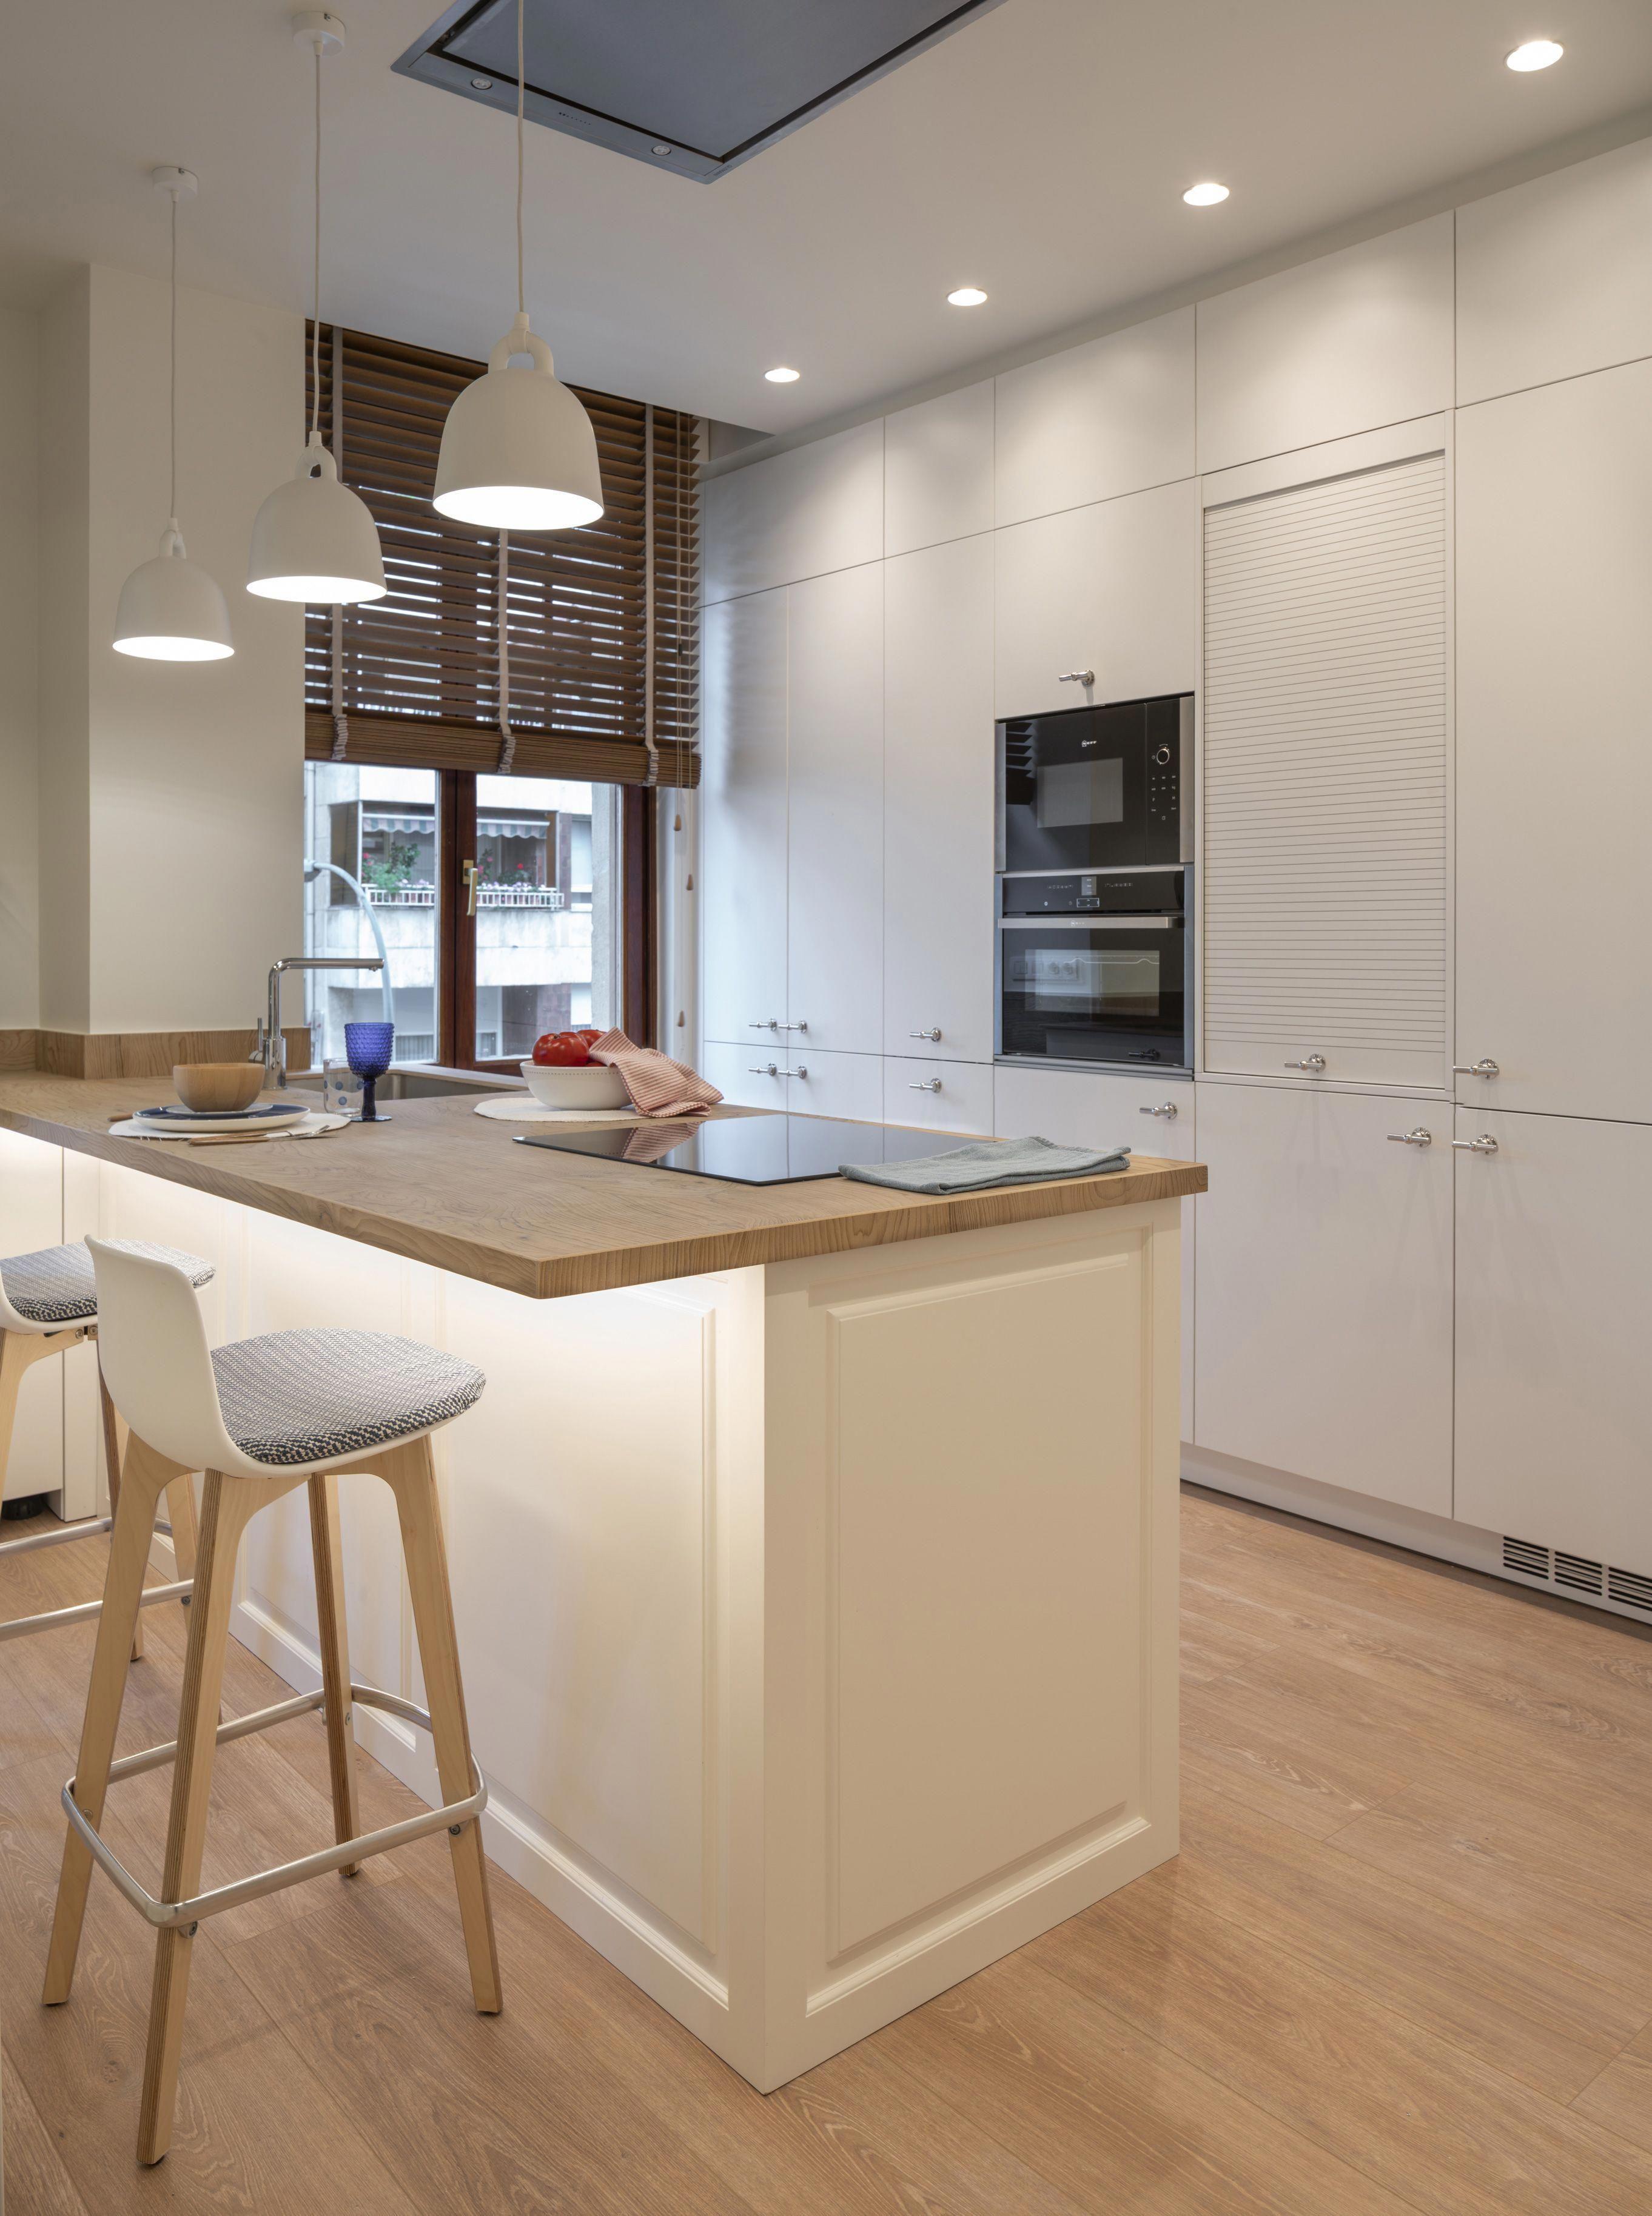 Diseno Interior De Cocina En Blanco Y Madera Con Peninsula Cocina Santos Estudio Bilbao Taburetes Small Kitchen Decor Interior Design Kitchen Kitchen Design